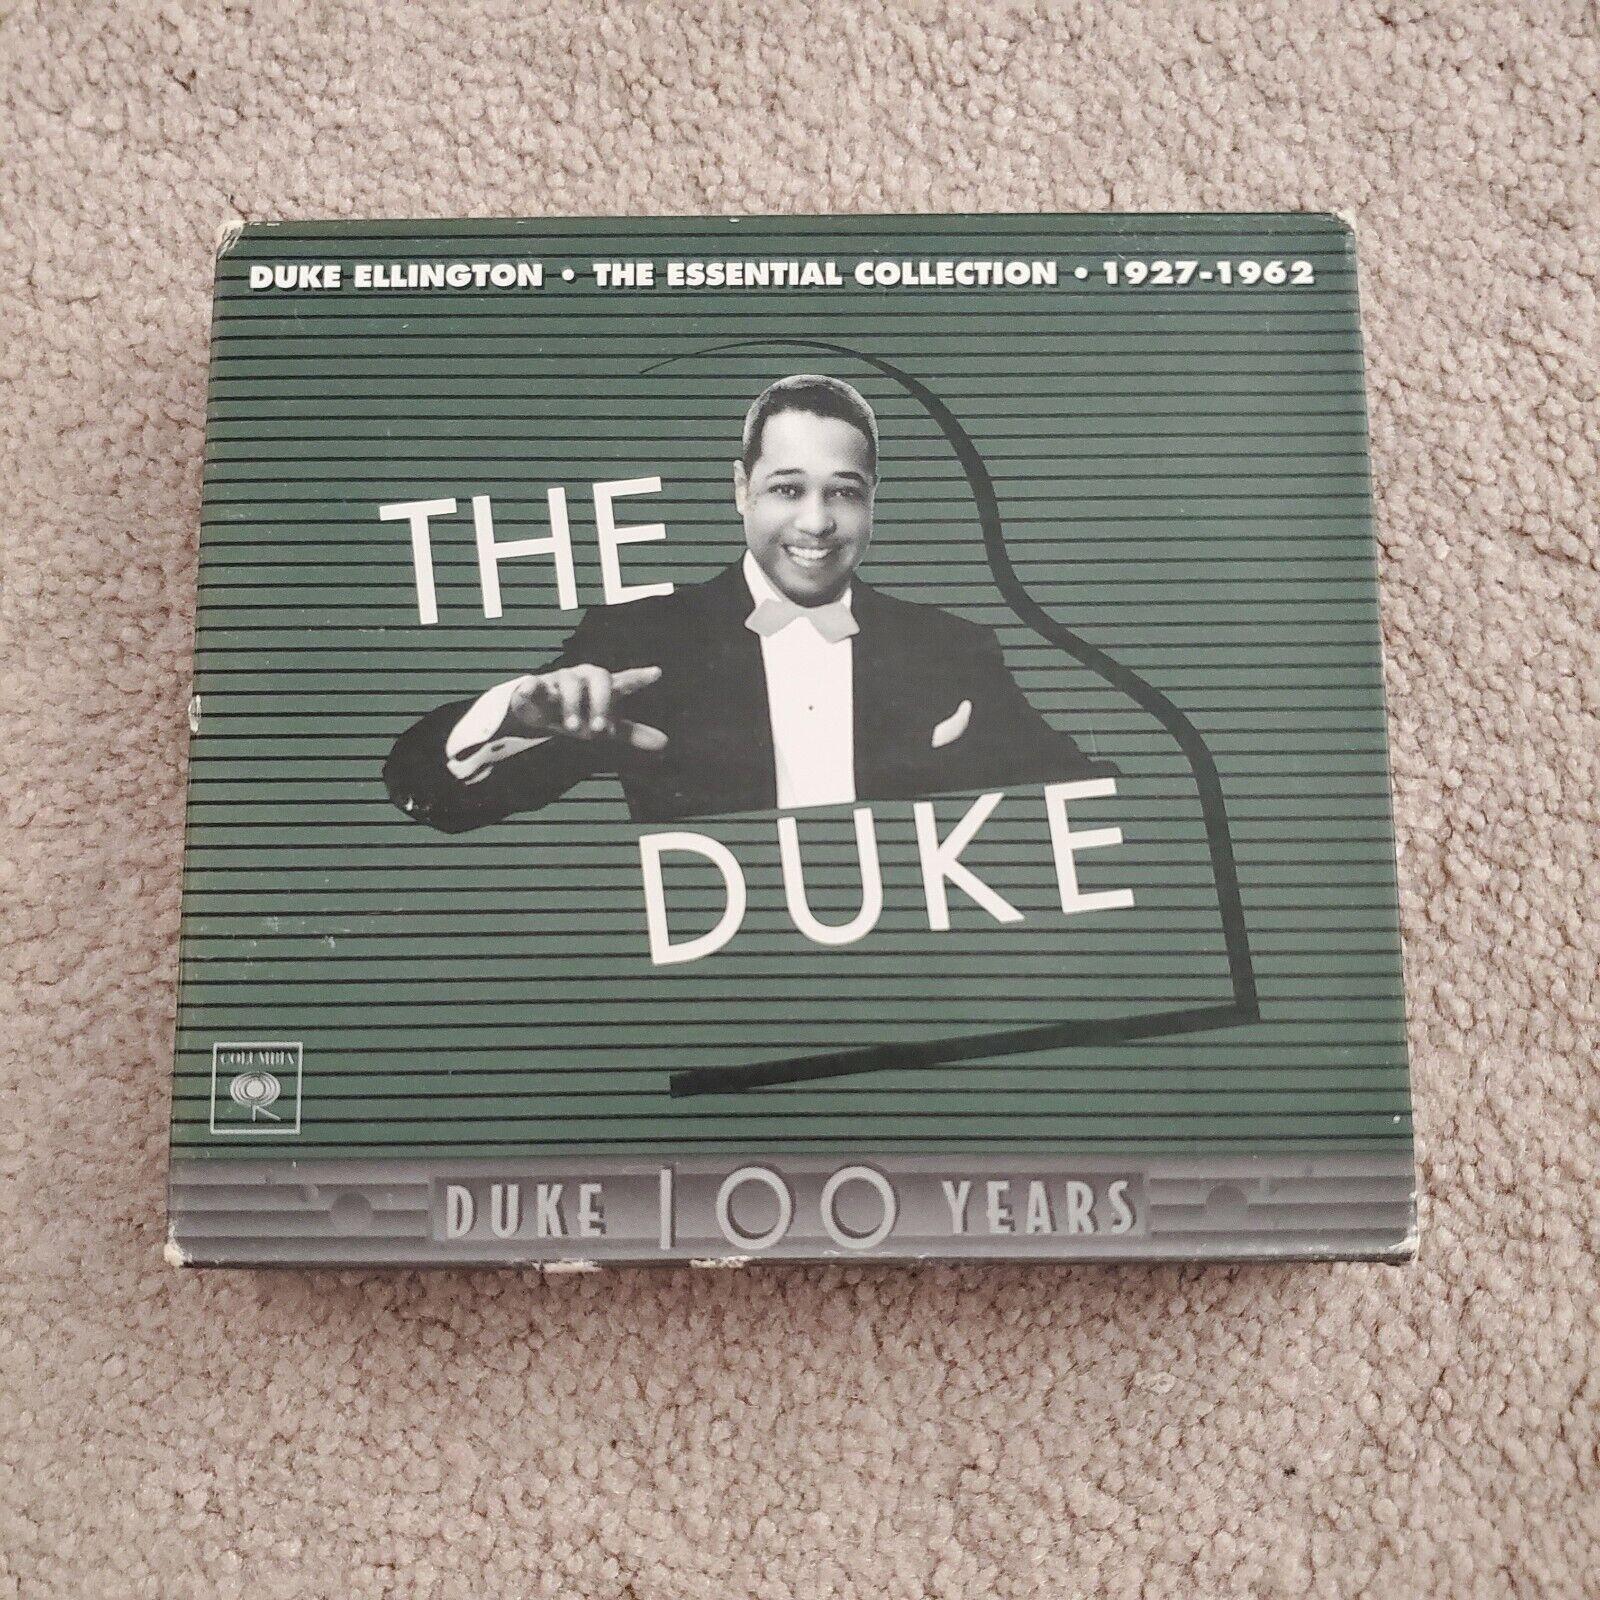 Duke Ellington The Duke The Columbia Years 1927-1962 3-CD Set W/Book - VG - $8.00